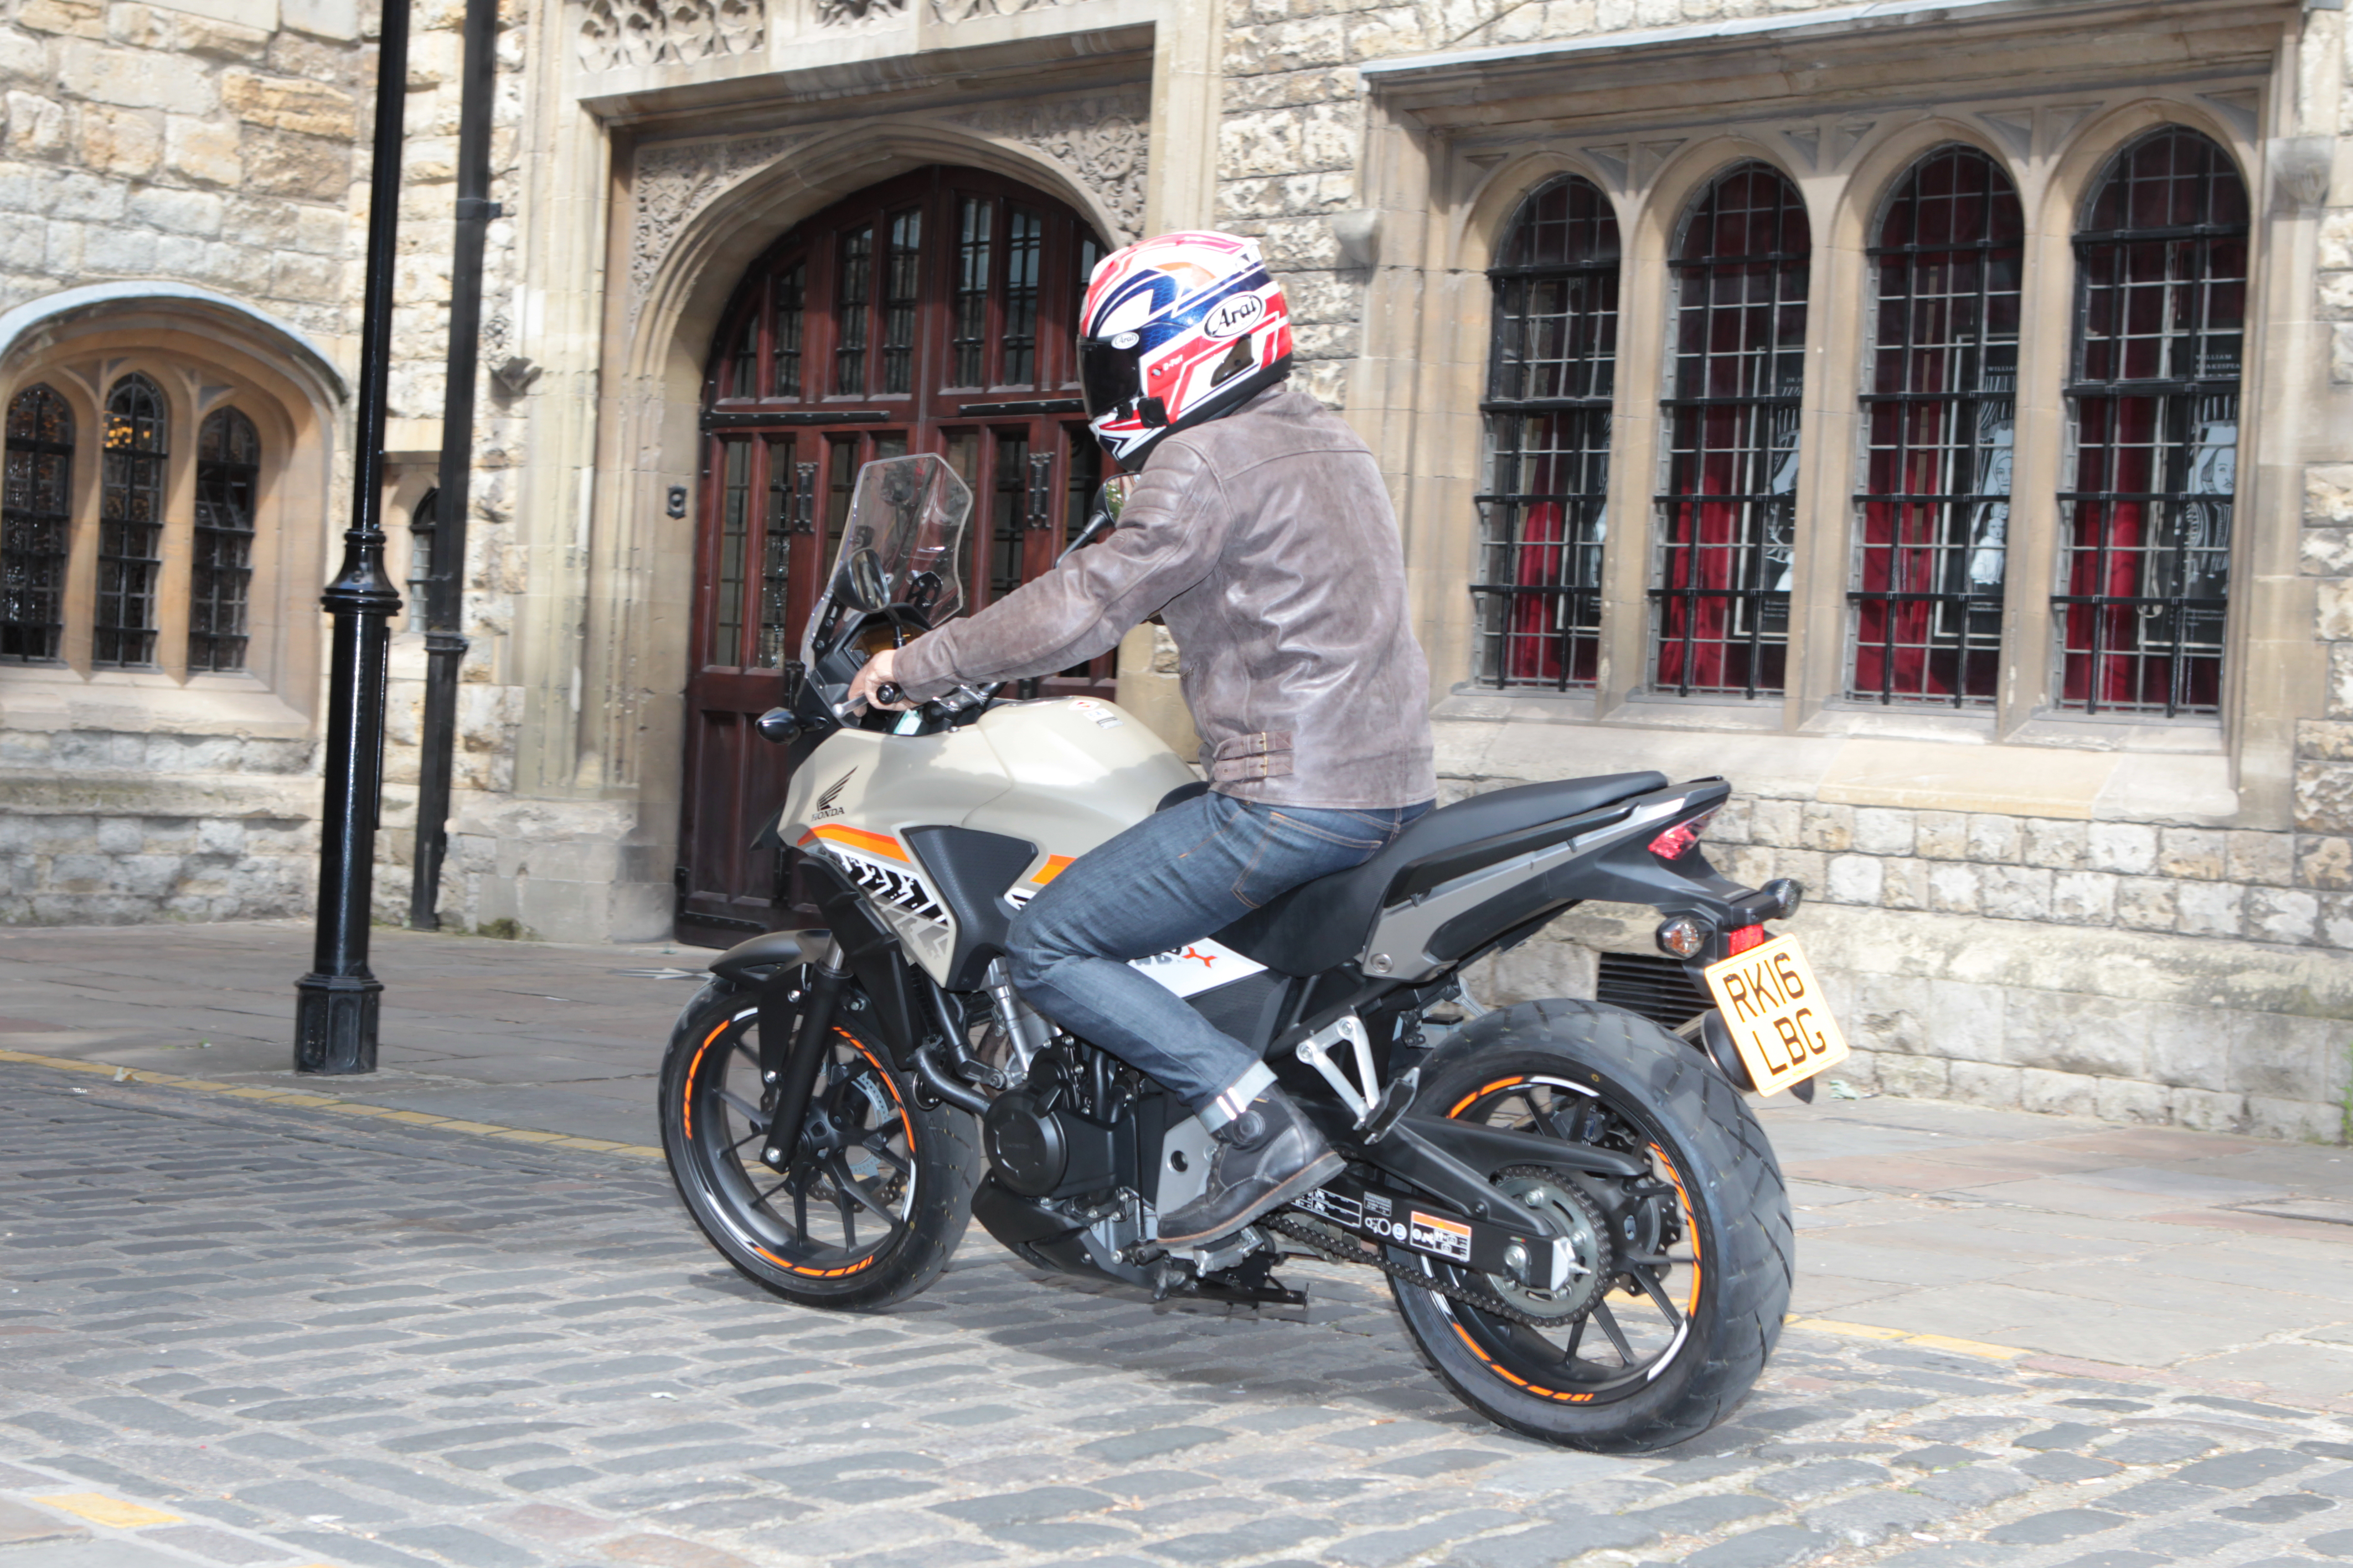 Honda cbx 500 review - 2016 Honda Cb500x